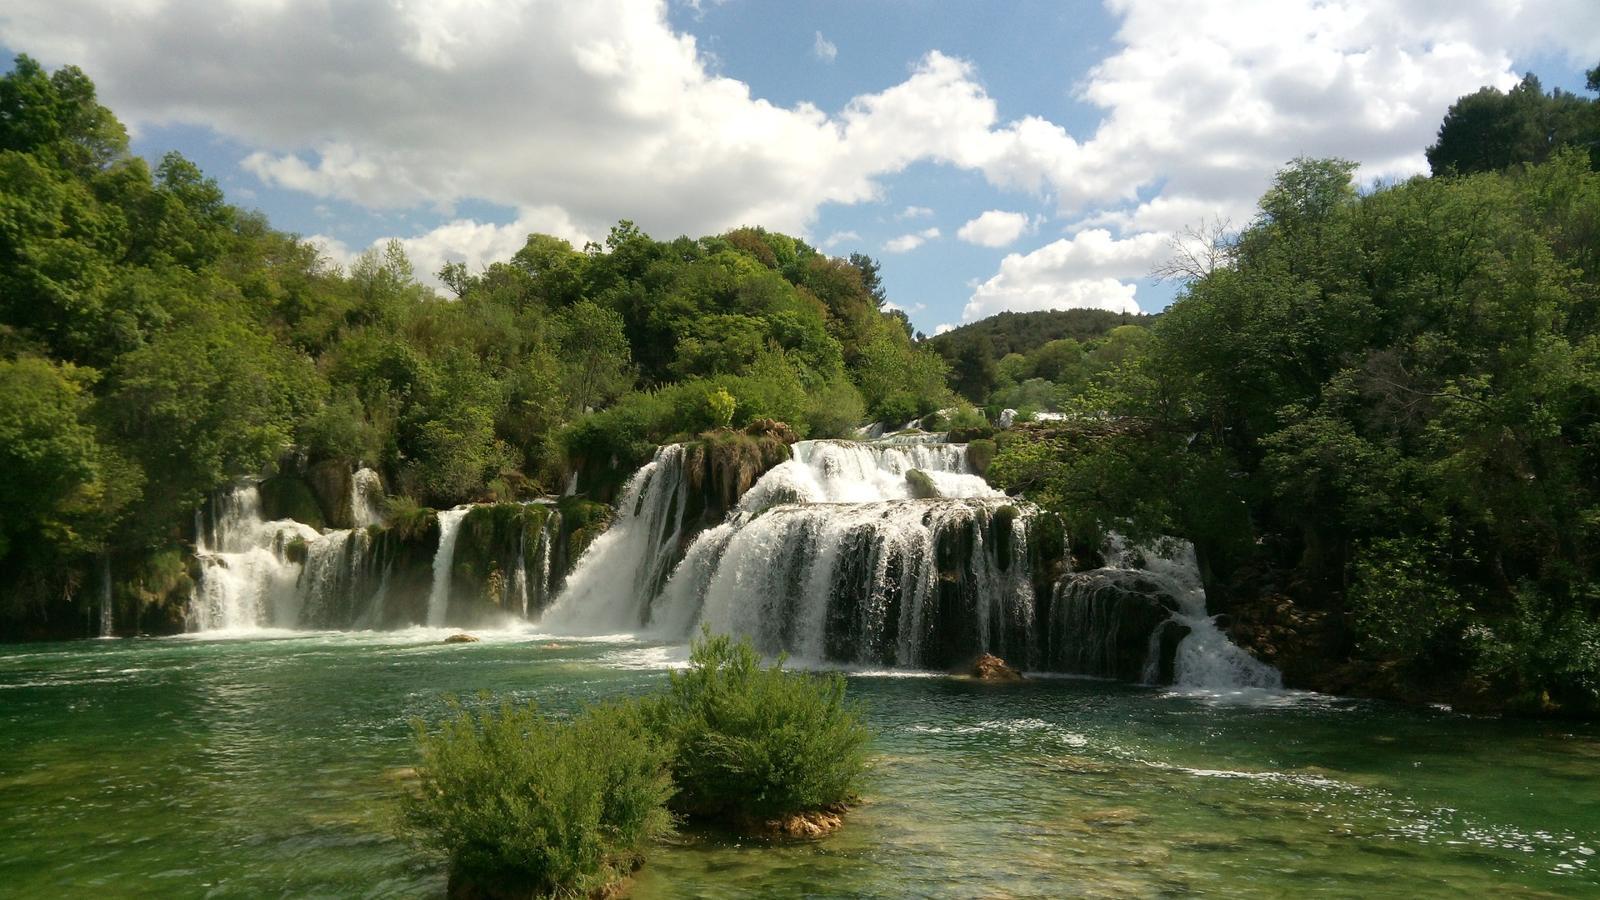 Worth a visit: Krka Waterfalls National Park in Croatia